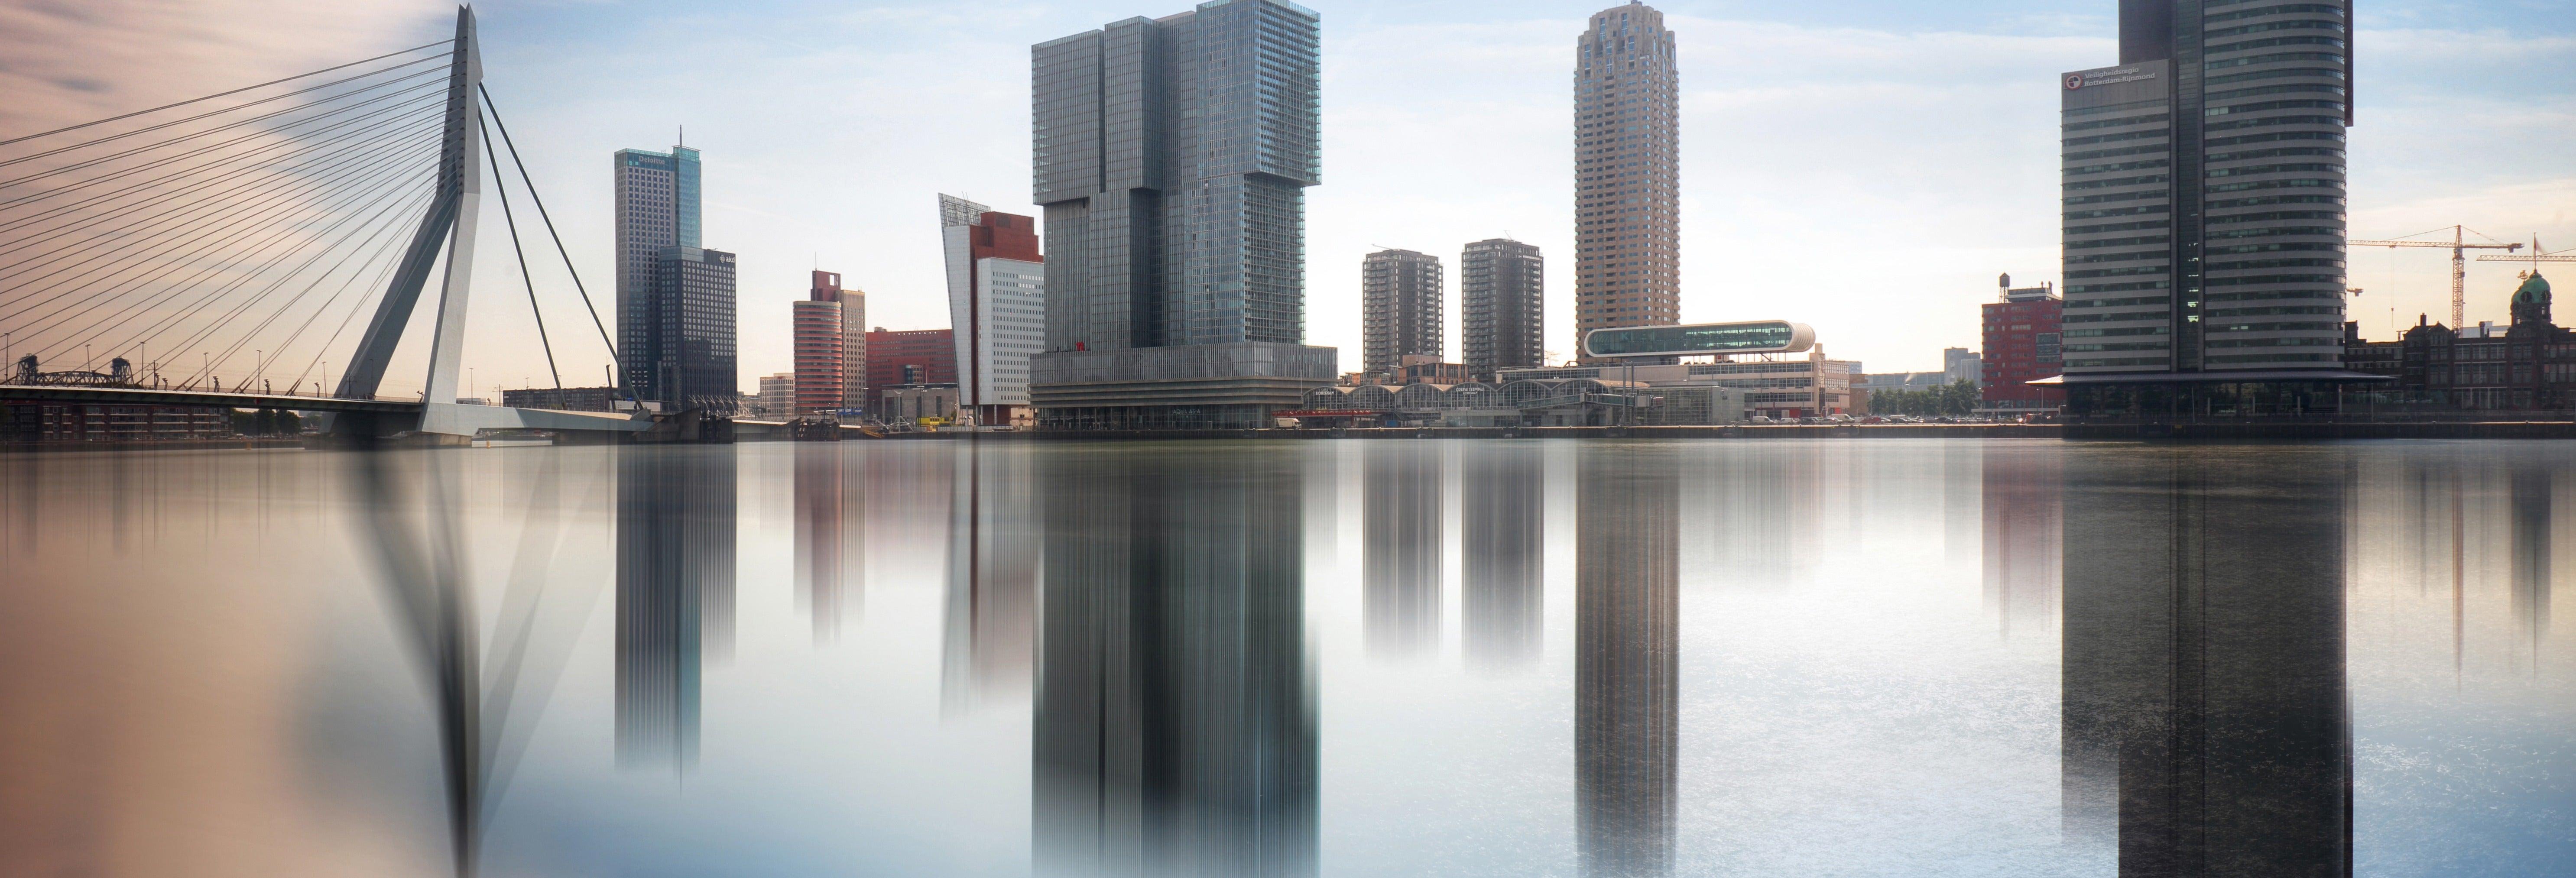 Visita del De Rotterdam + Tour in watertaxi